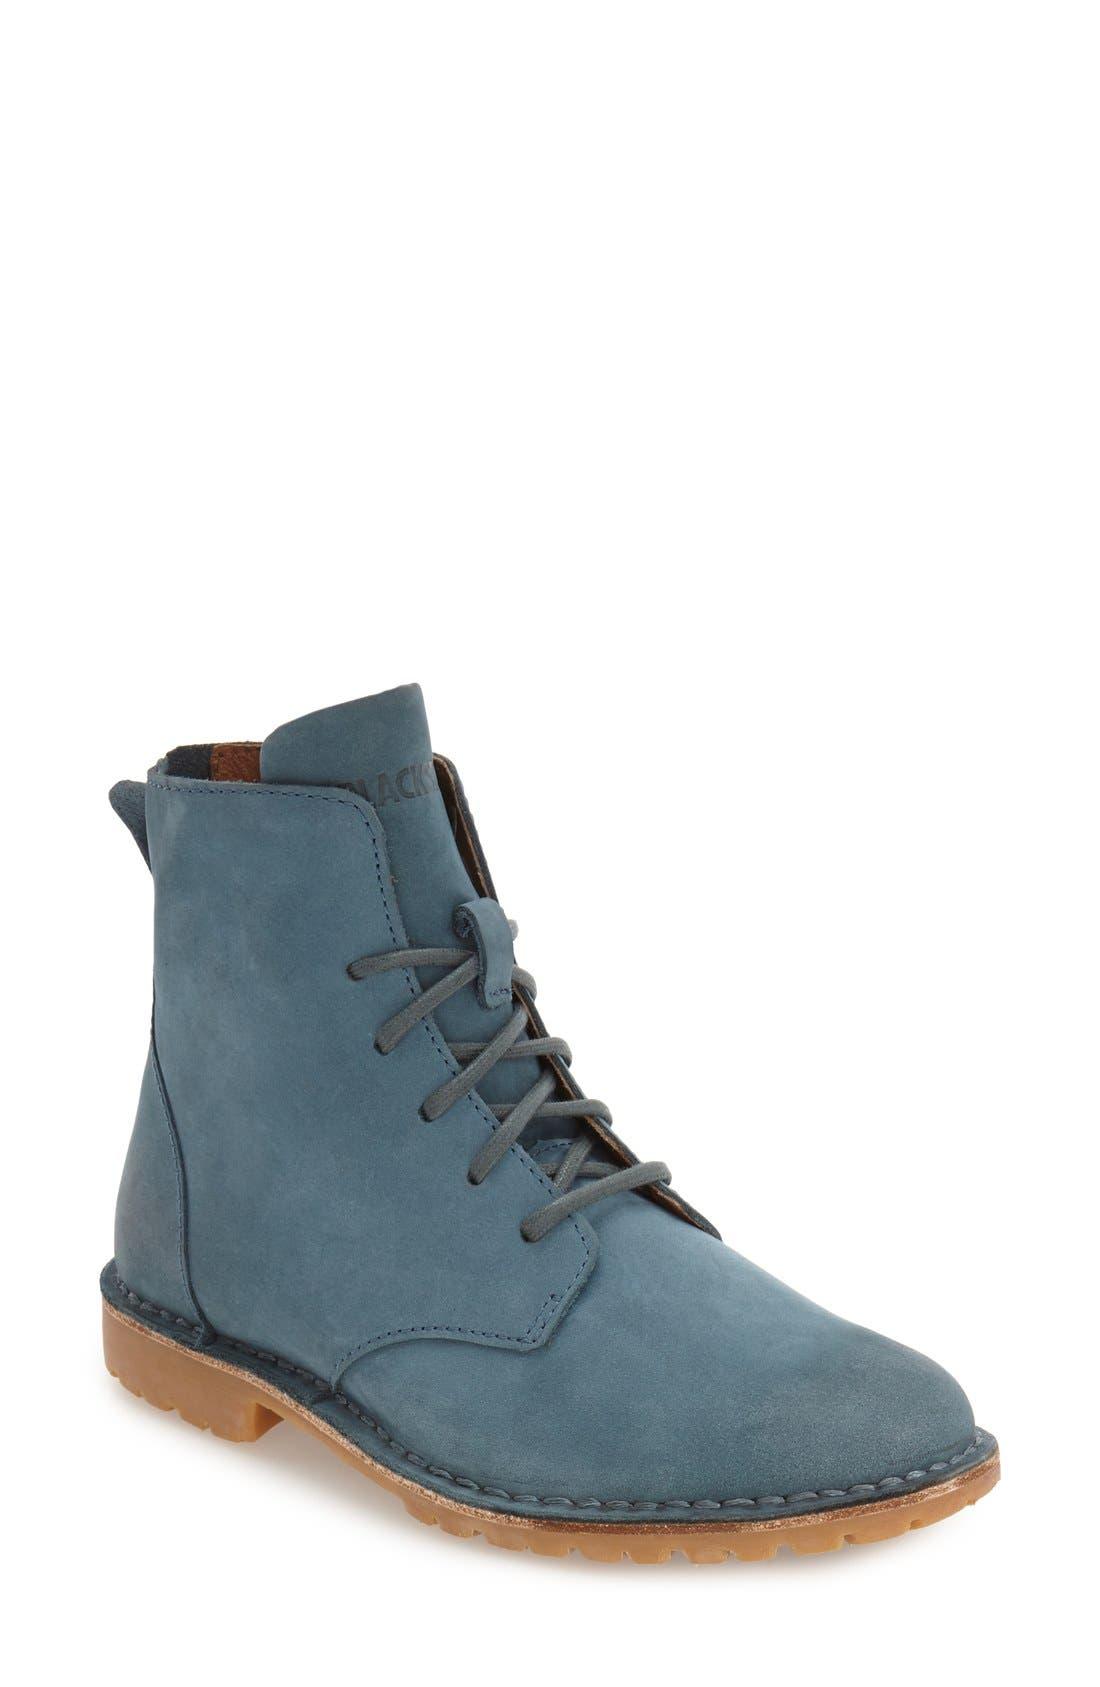 Main Image - Blackstone 'KL67' Lace-Up Boot (Women)